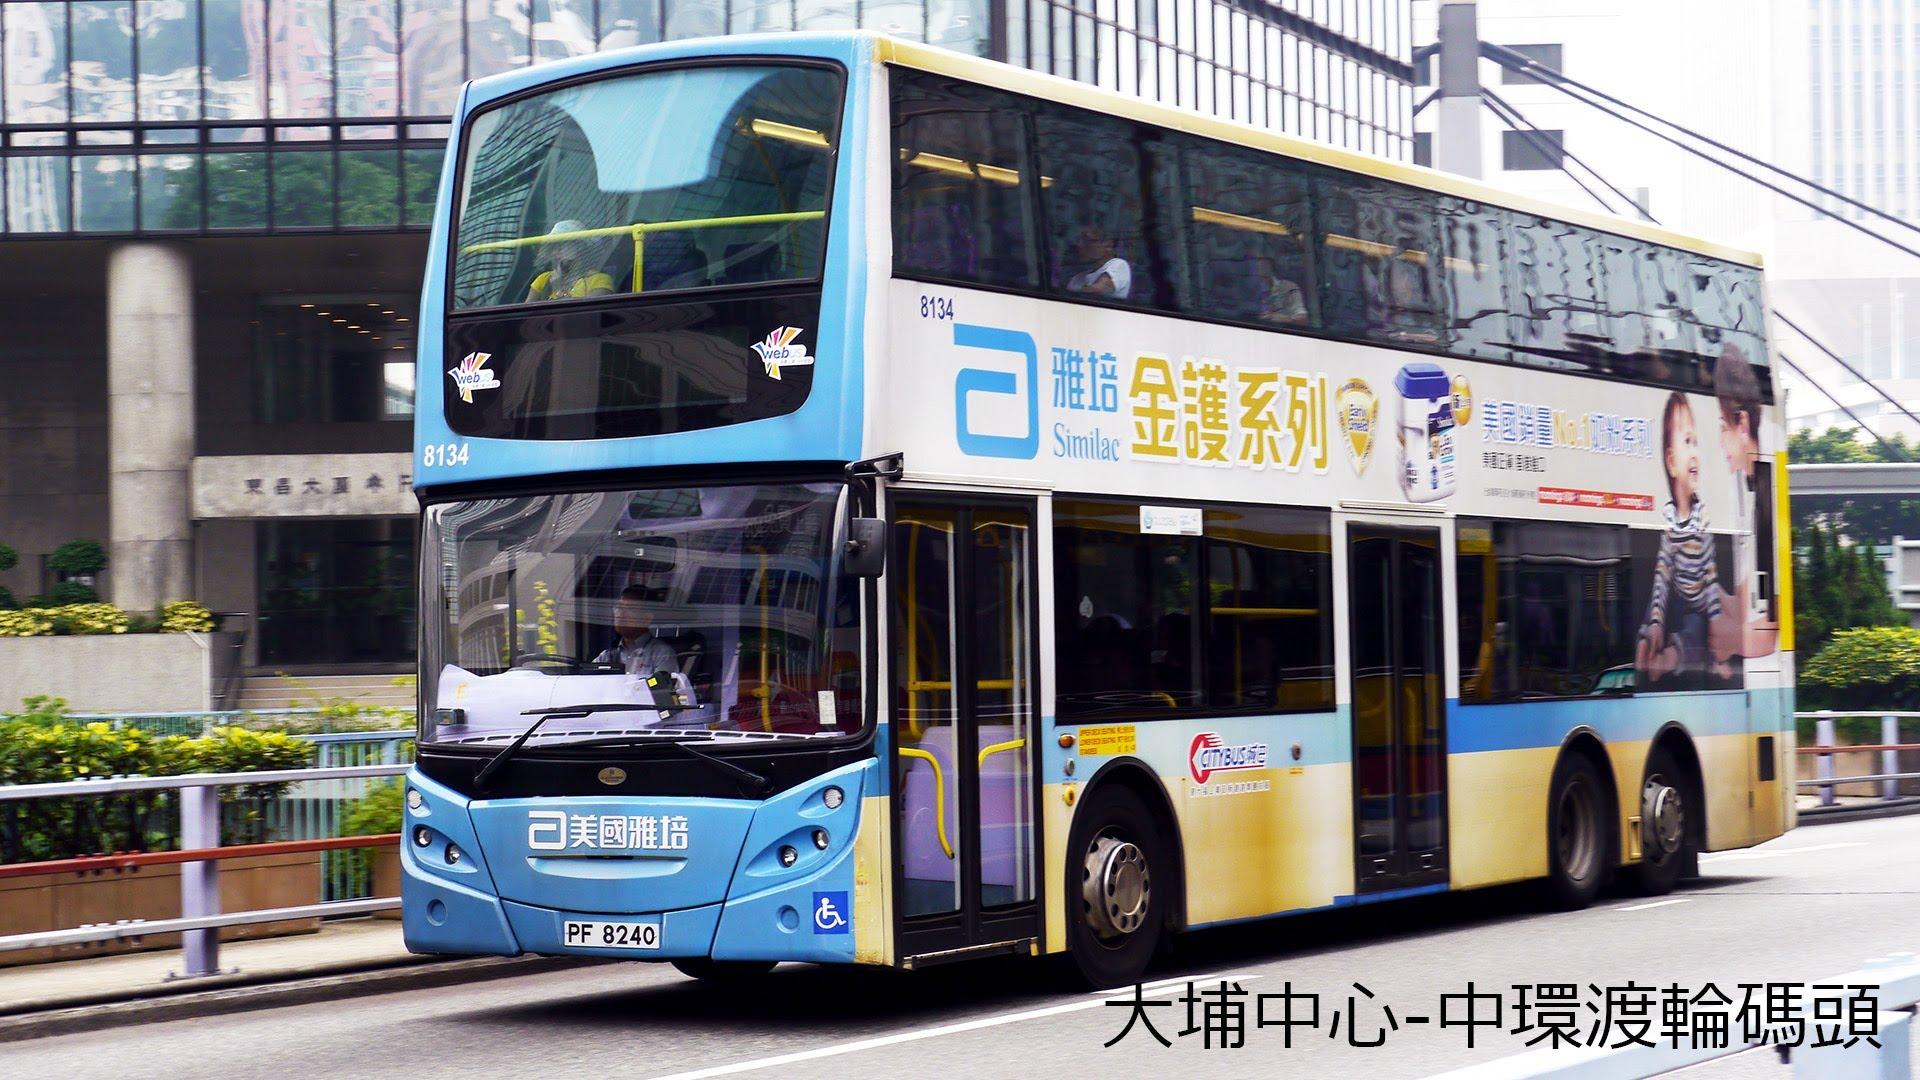 Hong Kong Bus Citybus 8134 @ 307 城巴 Dennis Enviro 500 大埔中心-中環渡輪碼頭